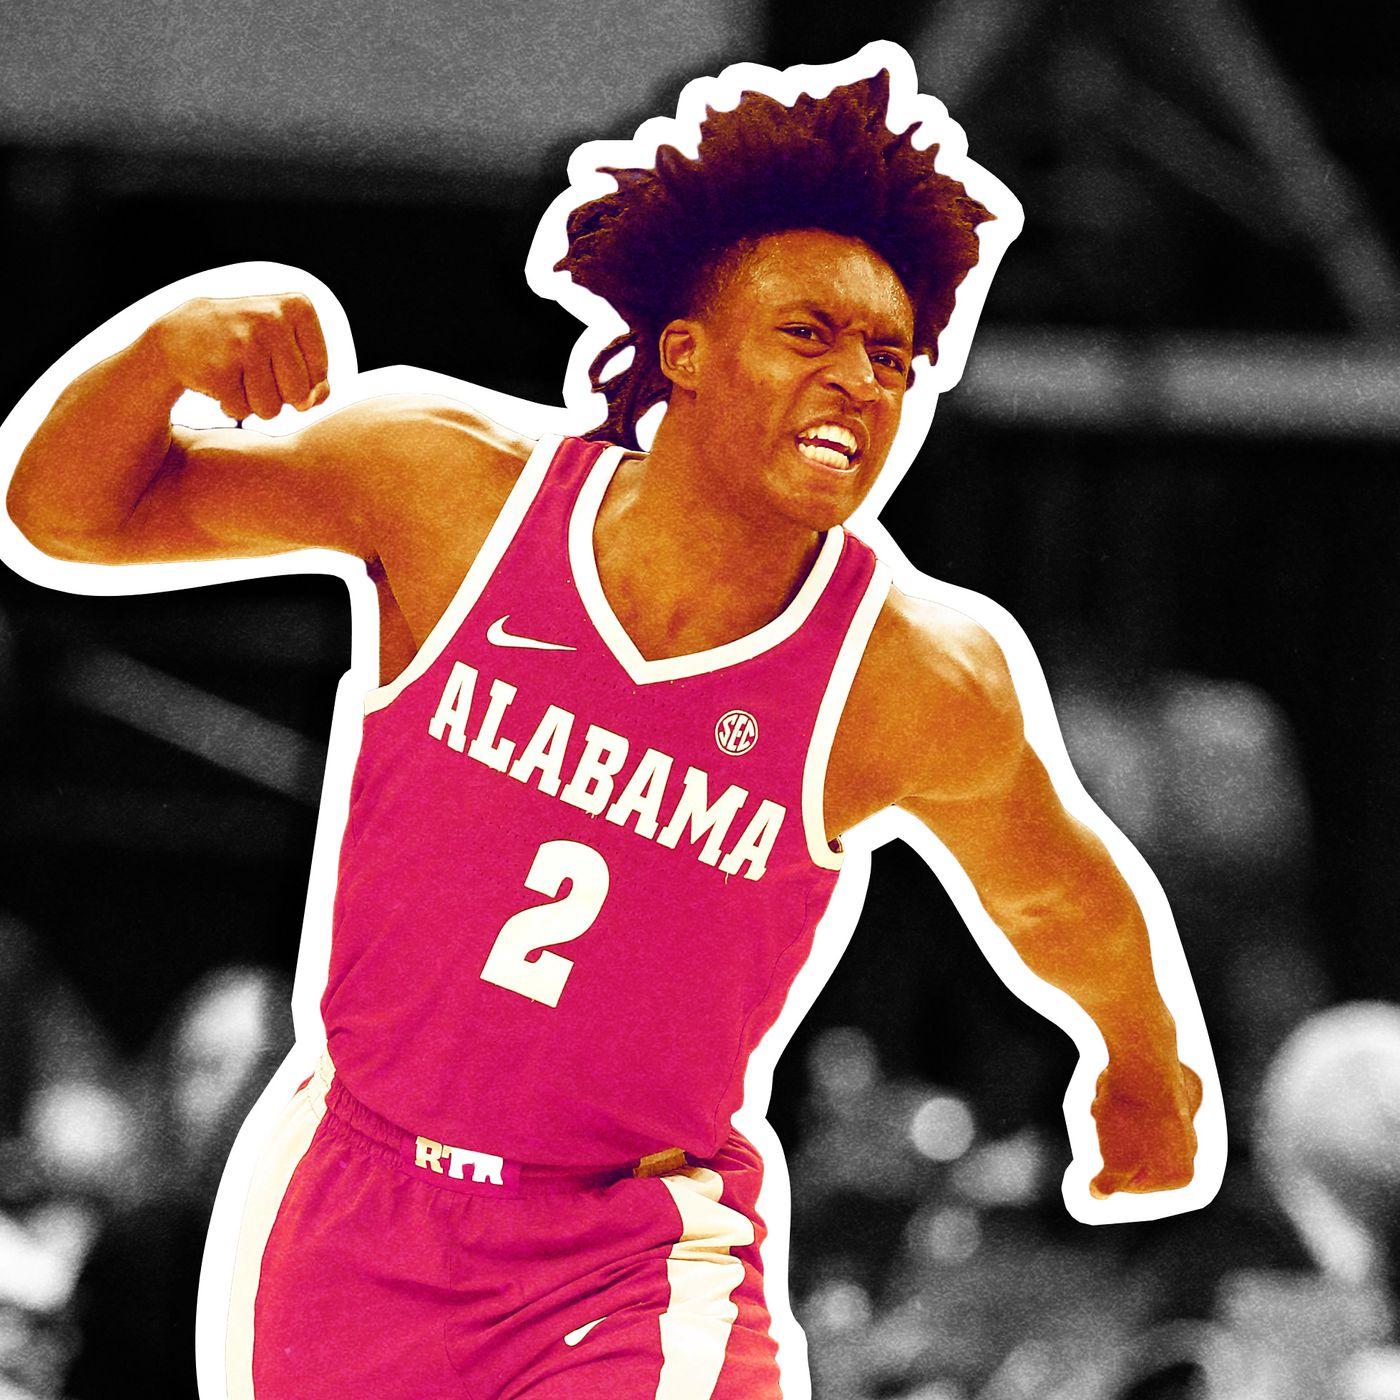 timeless design eb369 45da1 2018 NCAA Tournament: Collin Sexton Is Alabama's One-Man ...